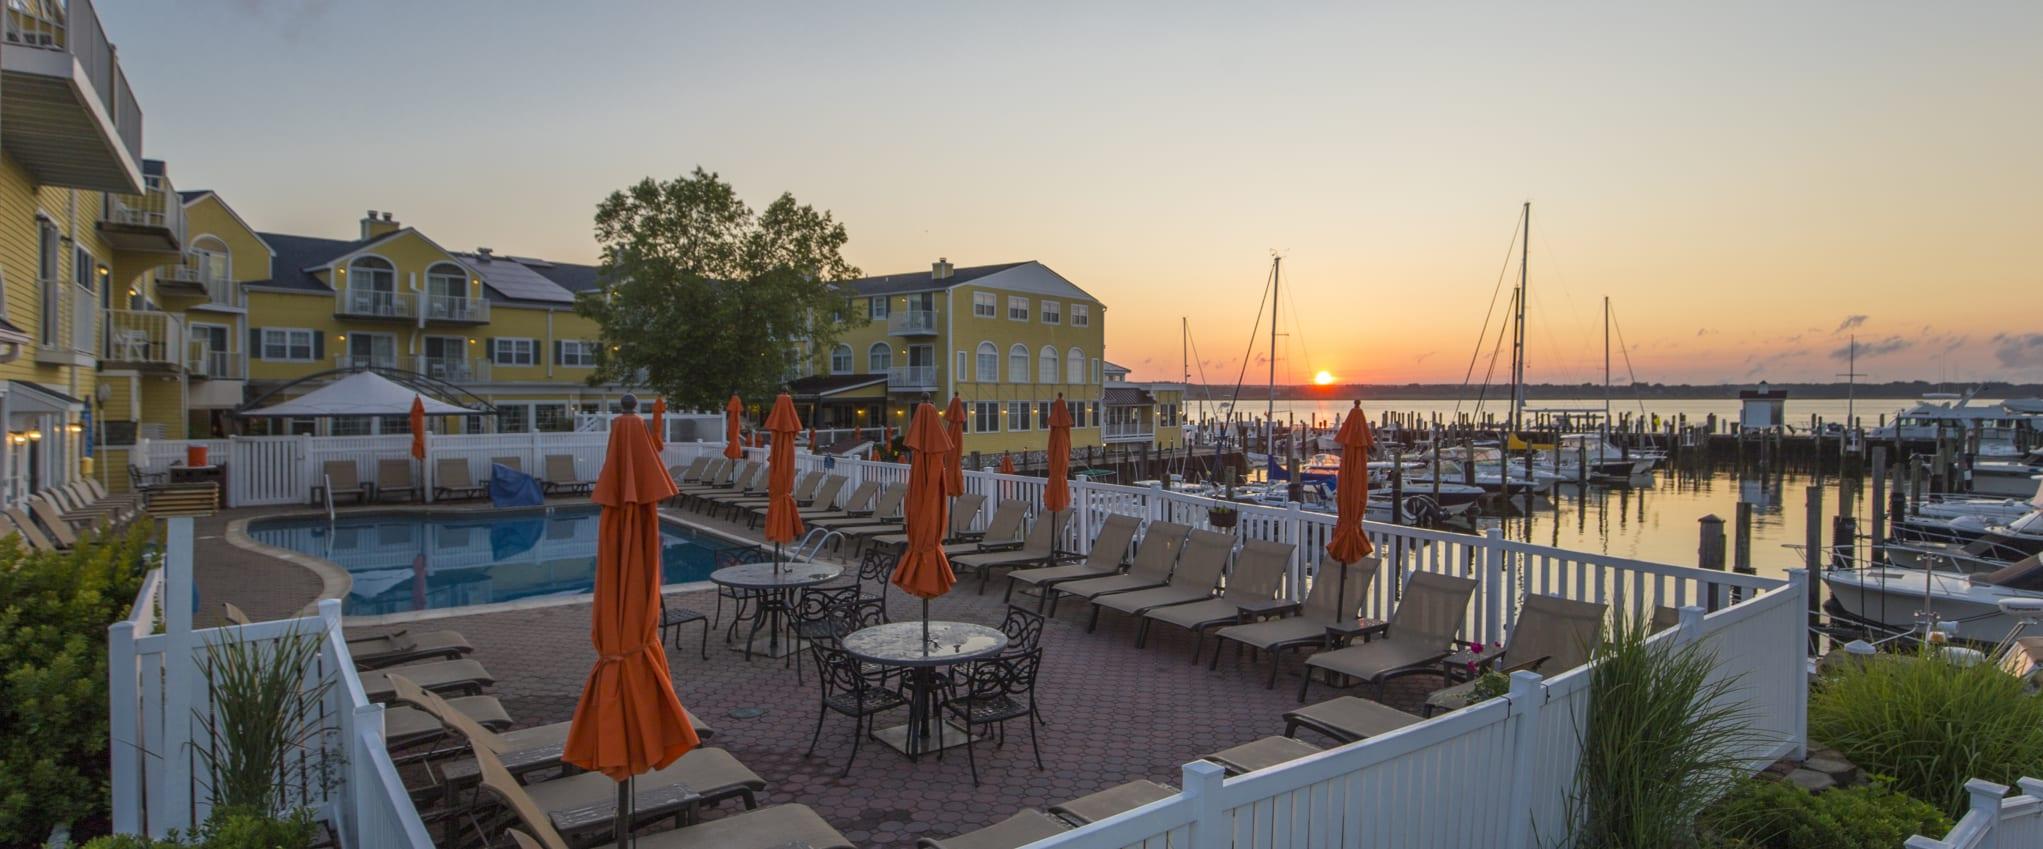 Saybrook Point Resort & Marina sunrise pool at sunset